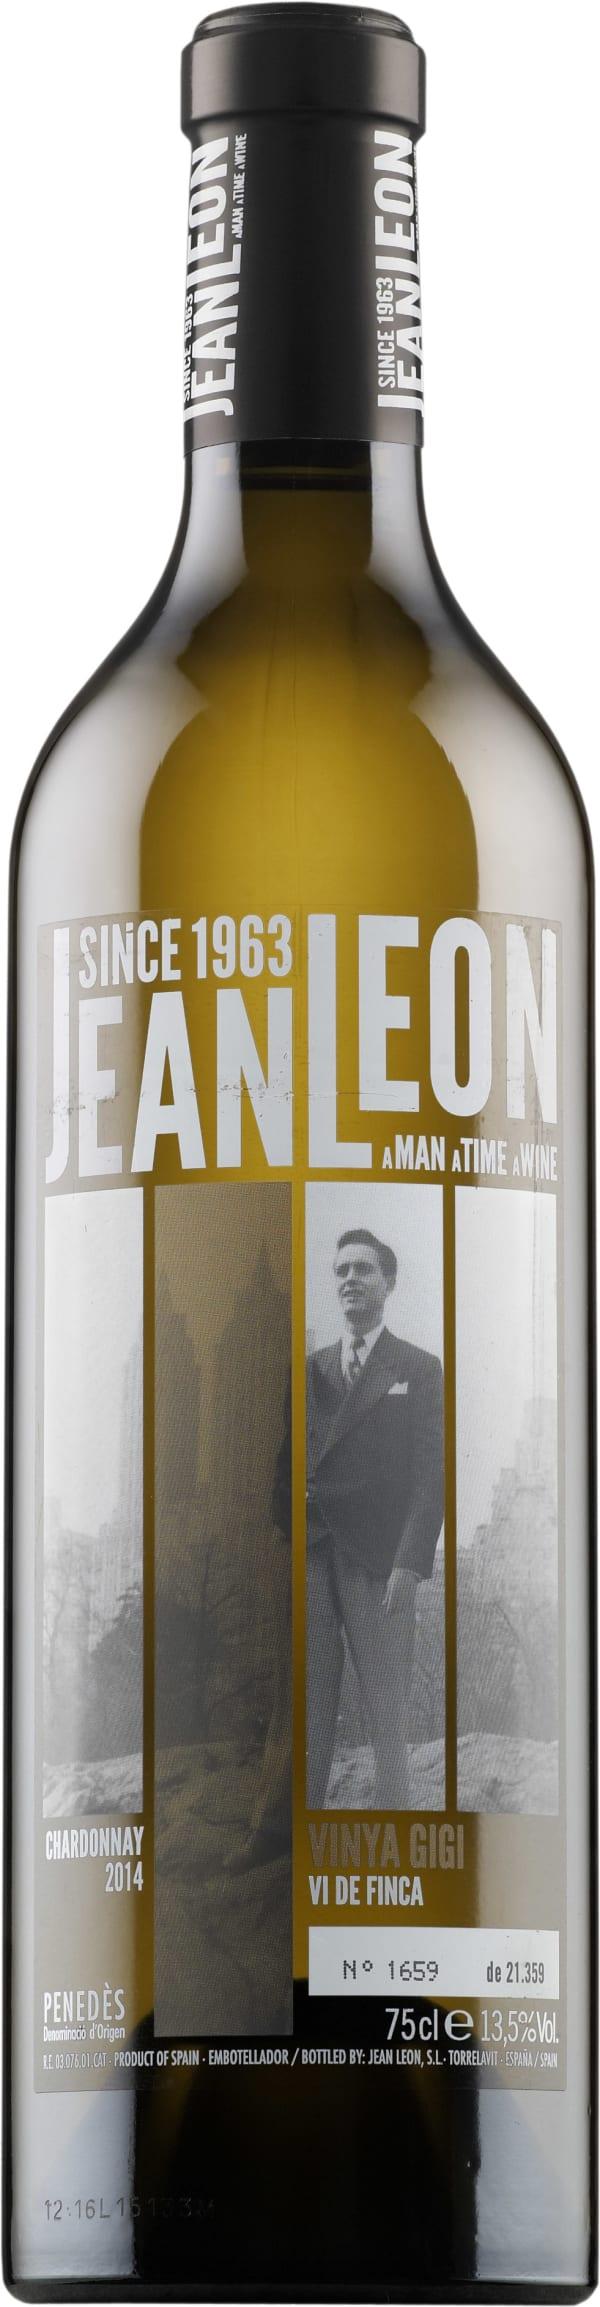 Jean Leon Vinya Gigi Chardonnay 2014